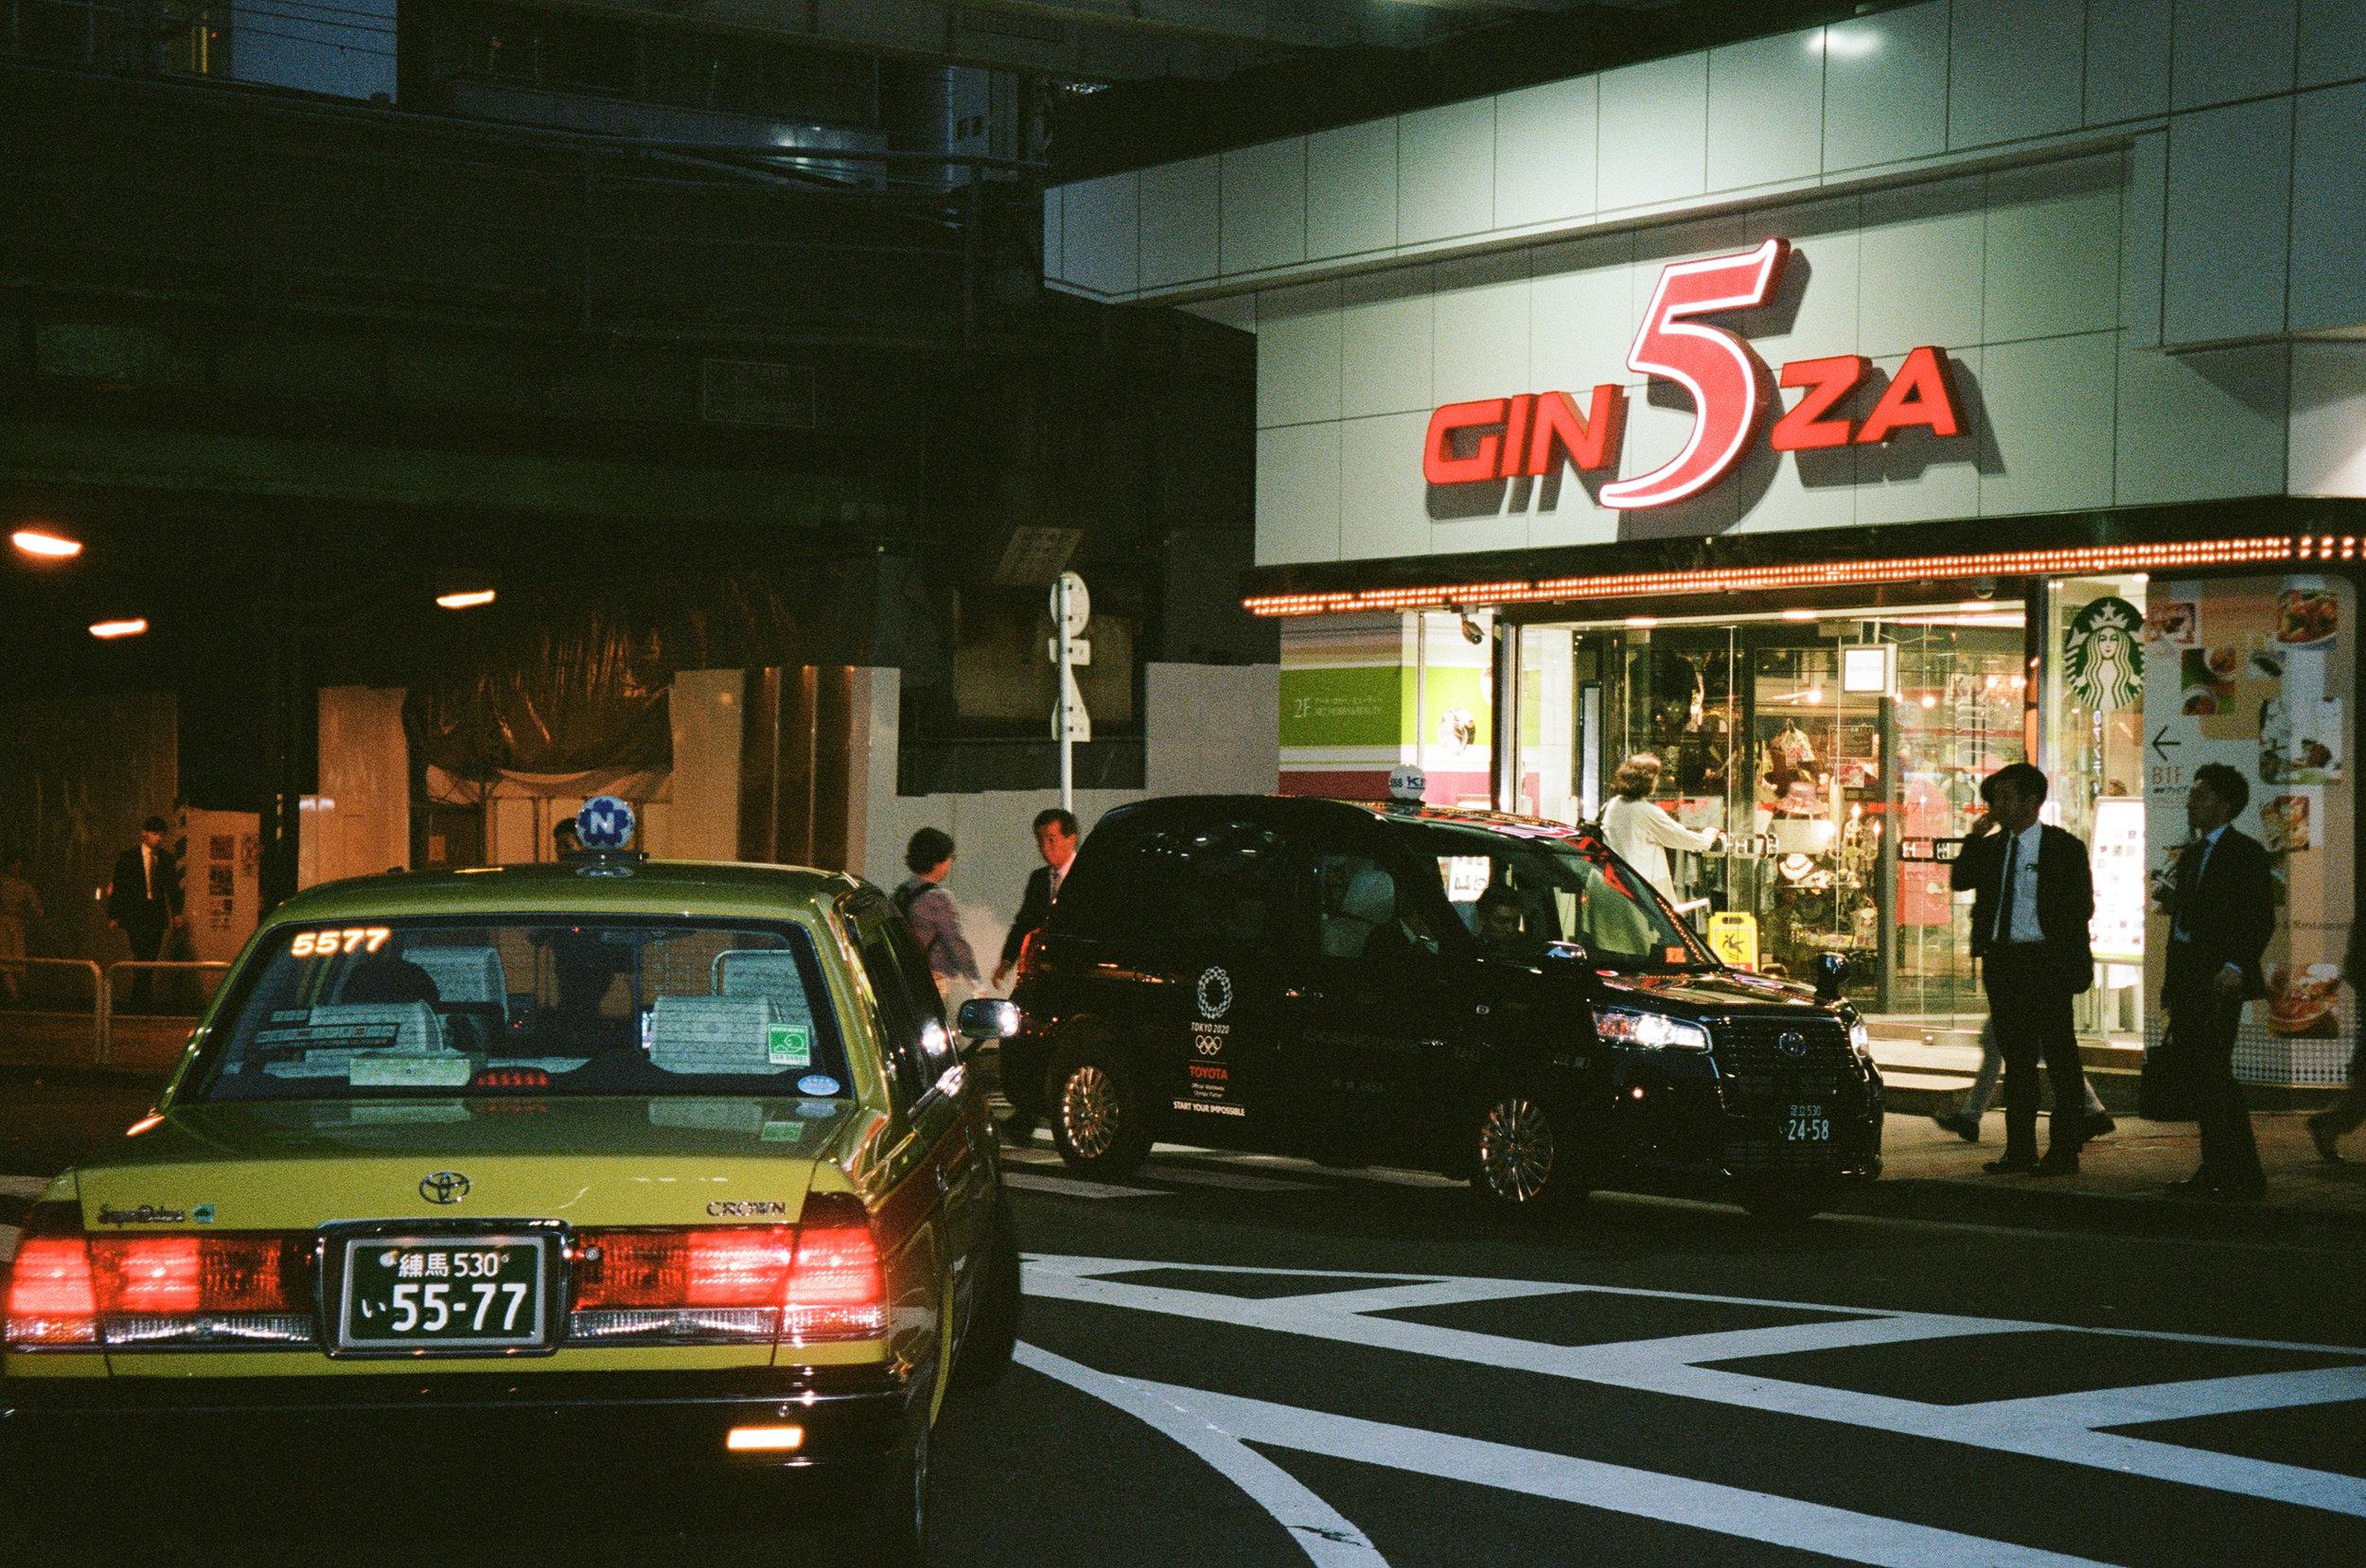 Japan_35mm-30.jpg